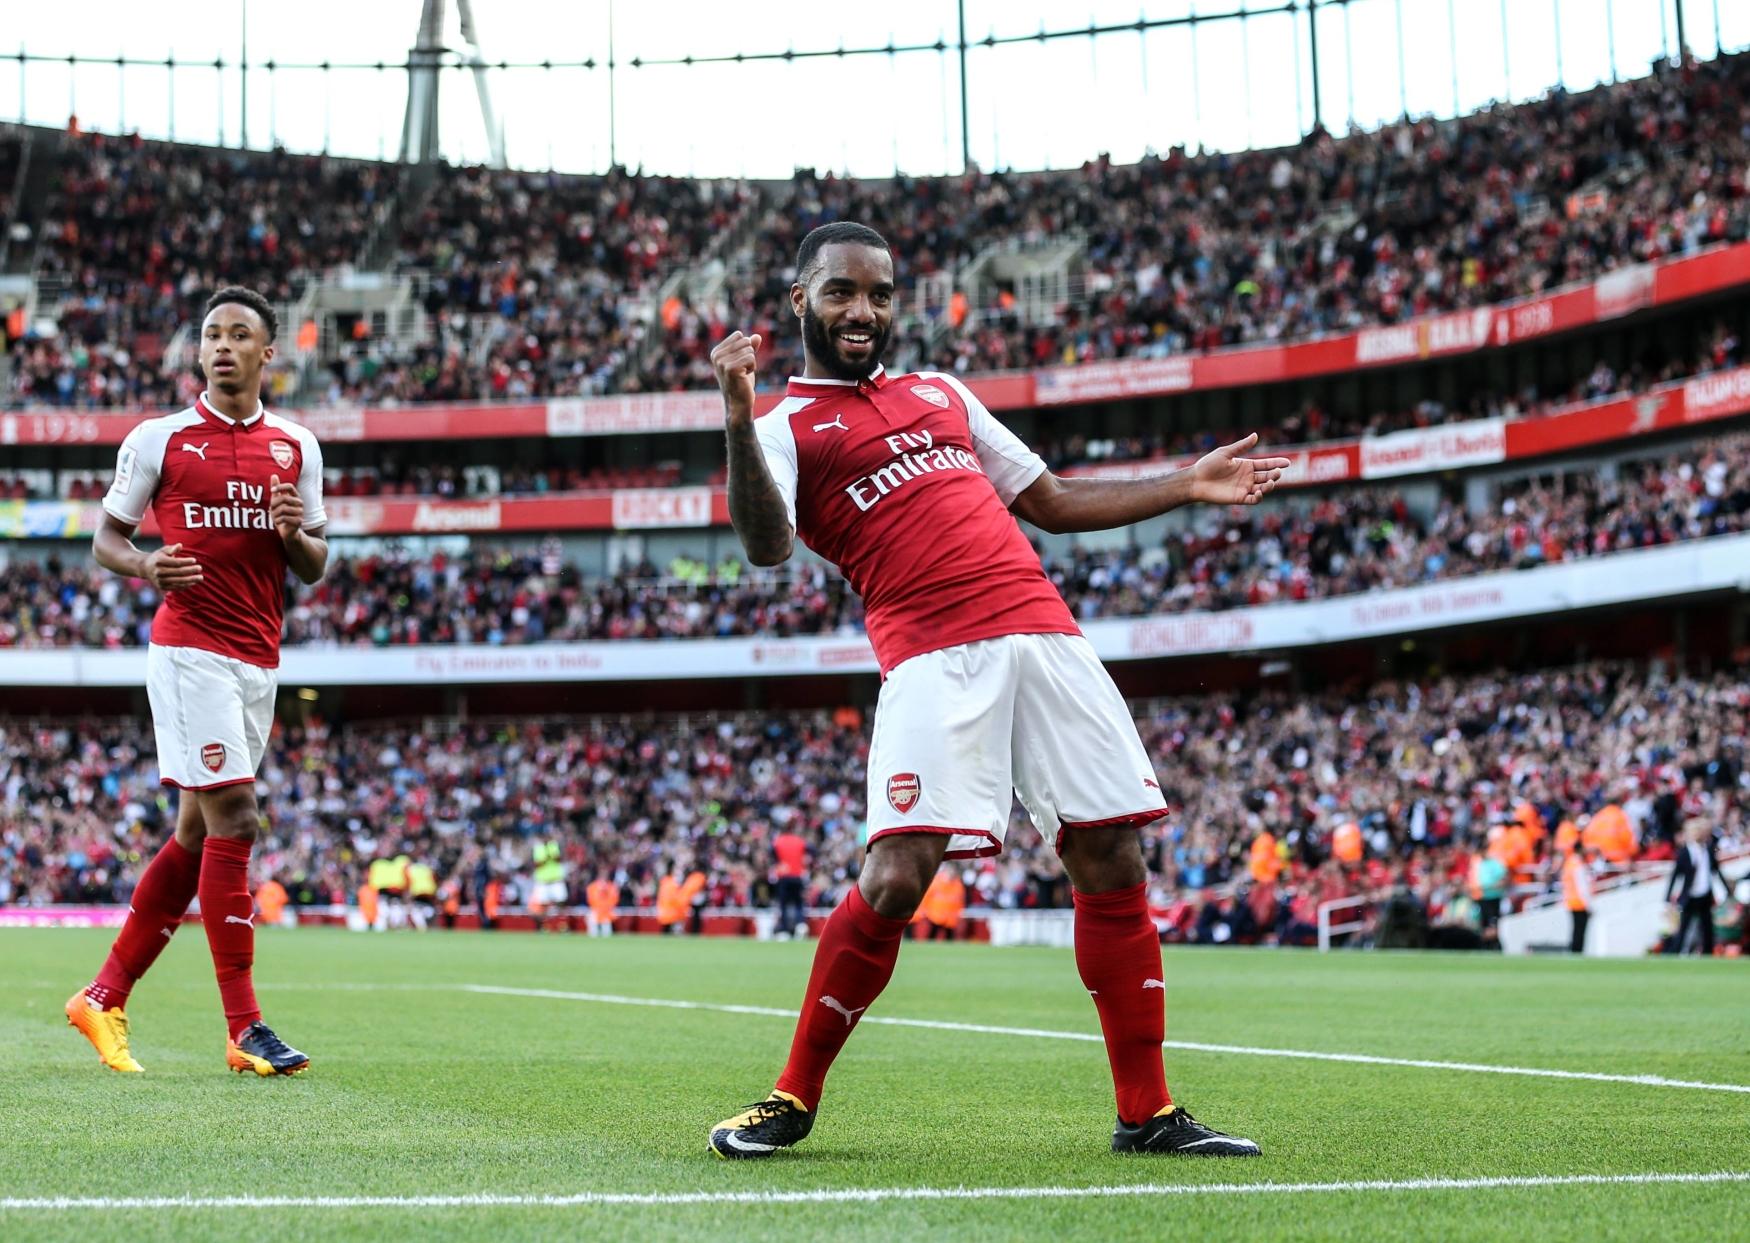 PREVIEW - 2. kolo anglické Premier League